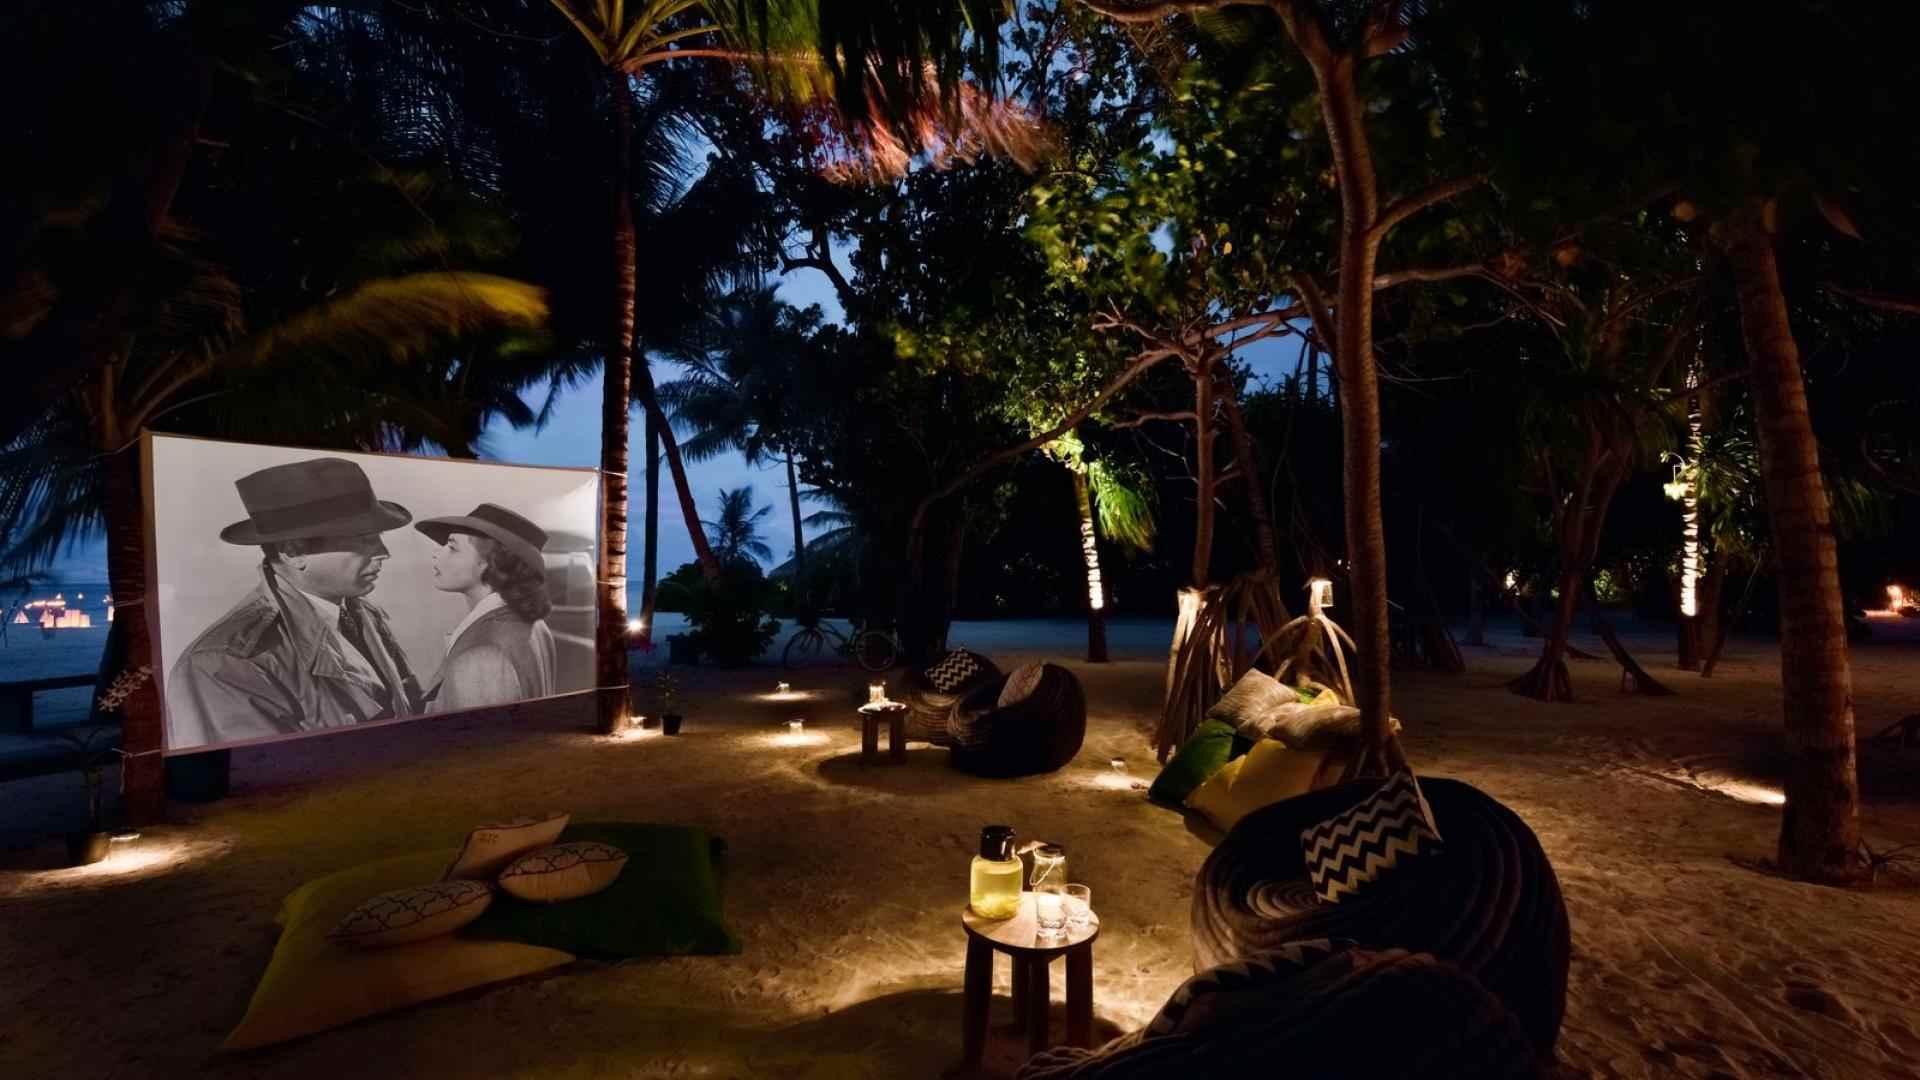 Kanuhura_Activities_cinema_on_the_beach-1599×1067-61c801f1-db3c-4ef6-aecd-1551840516d4